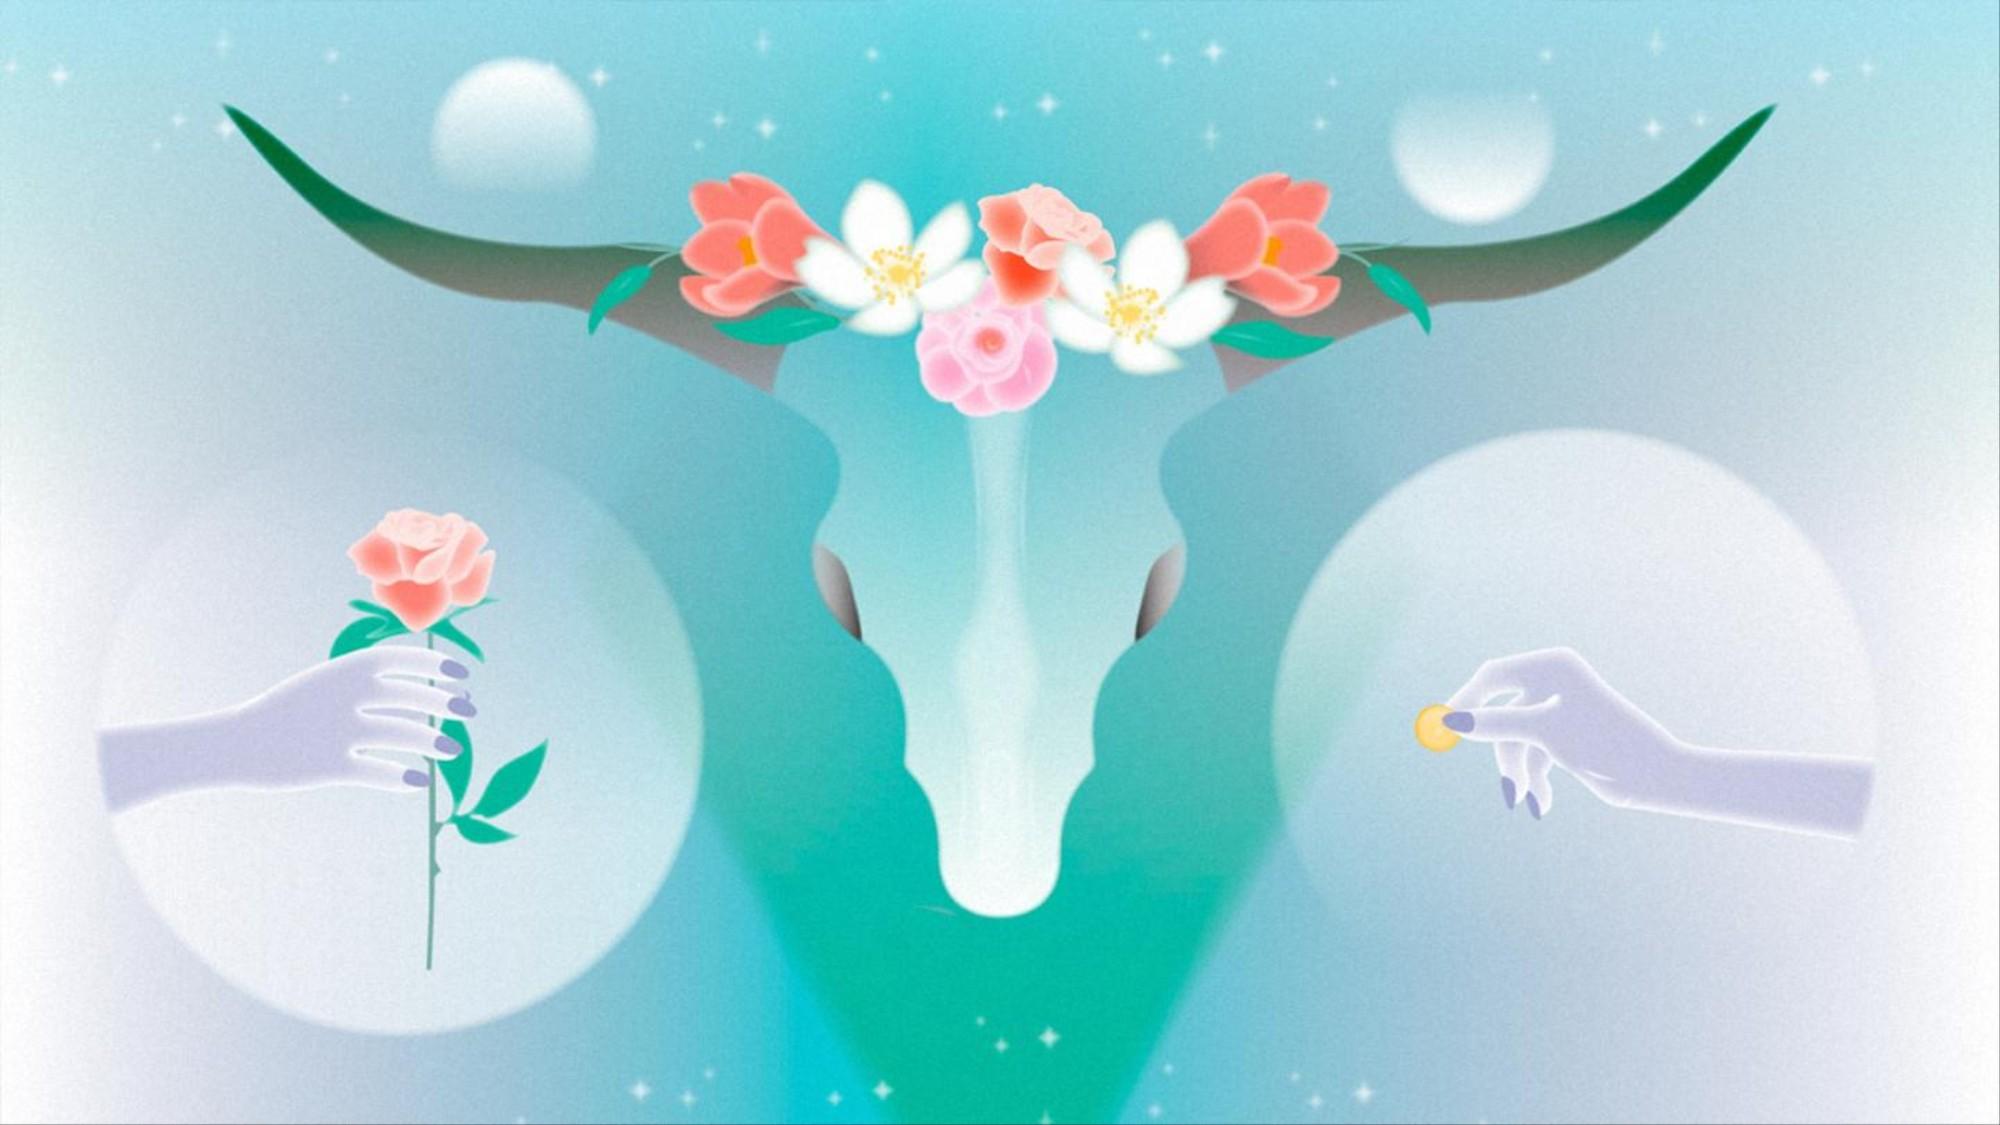 Monthly Horoscope: Taurus, September 2018 - VICE